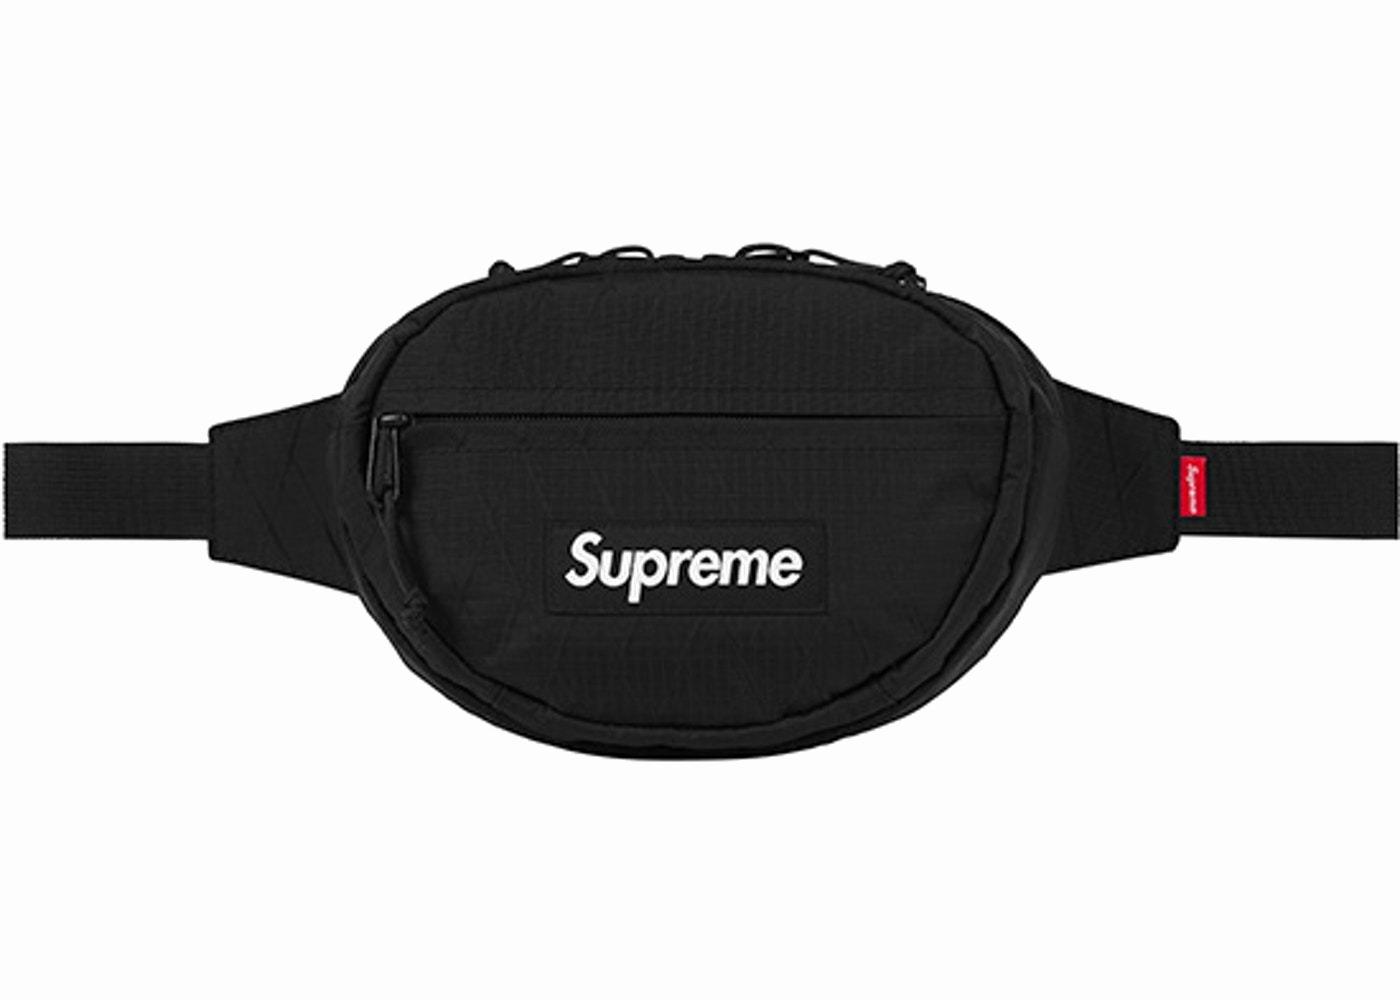 Supreme Template Roblox Awesome Supreme Waist Bag Fw18 Black – Lacedup